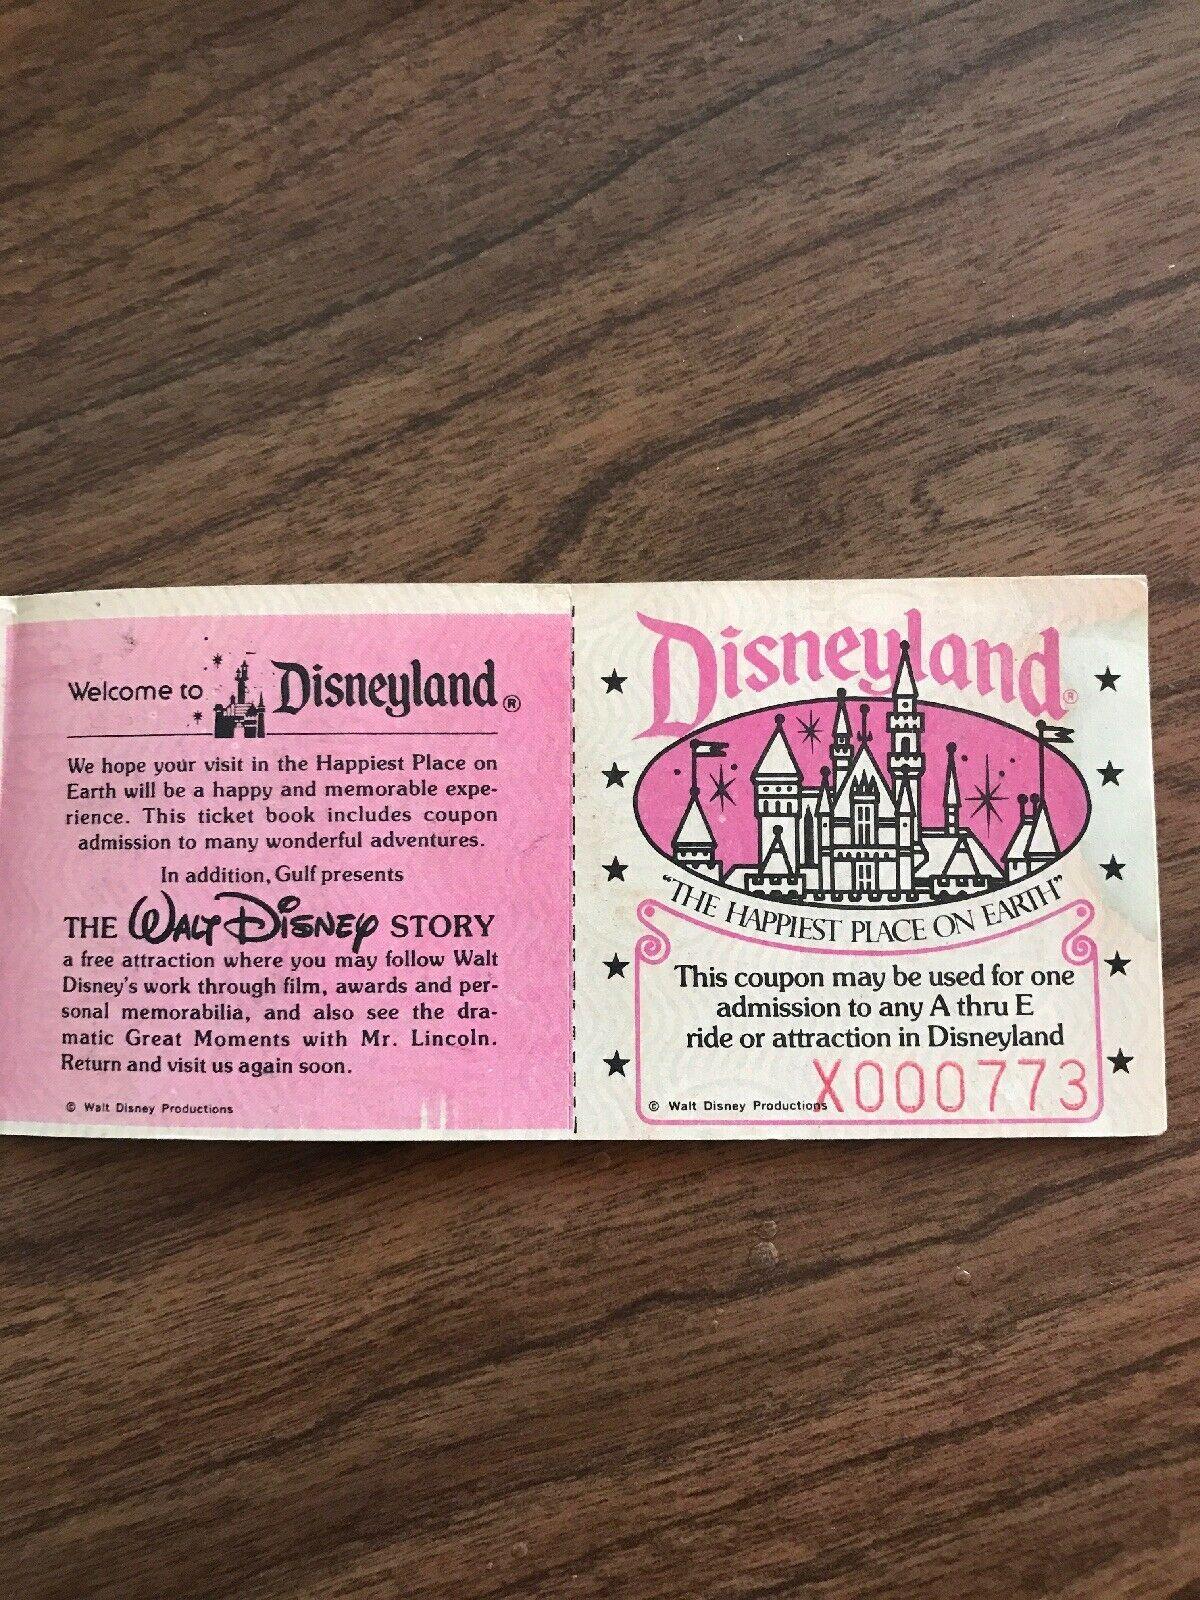 Disneyland ticket disneyland vintage disneyland how to